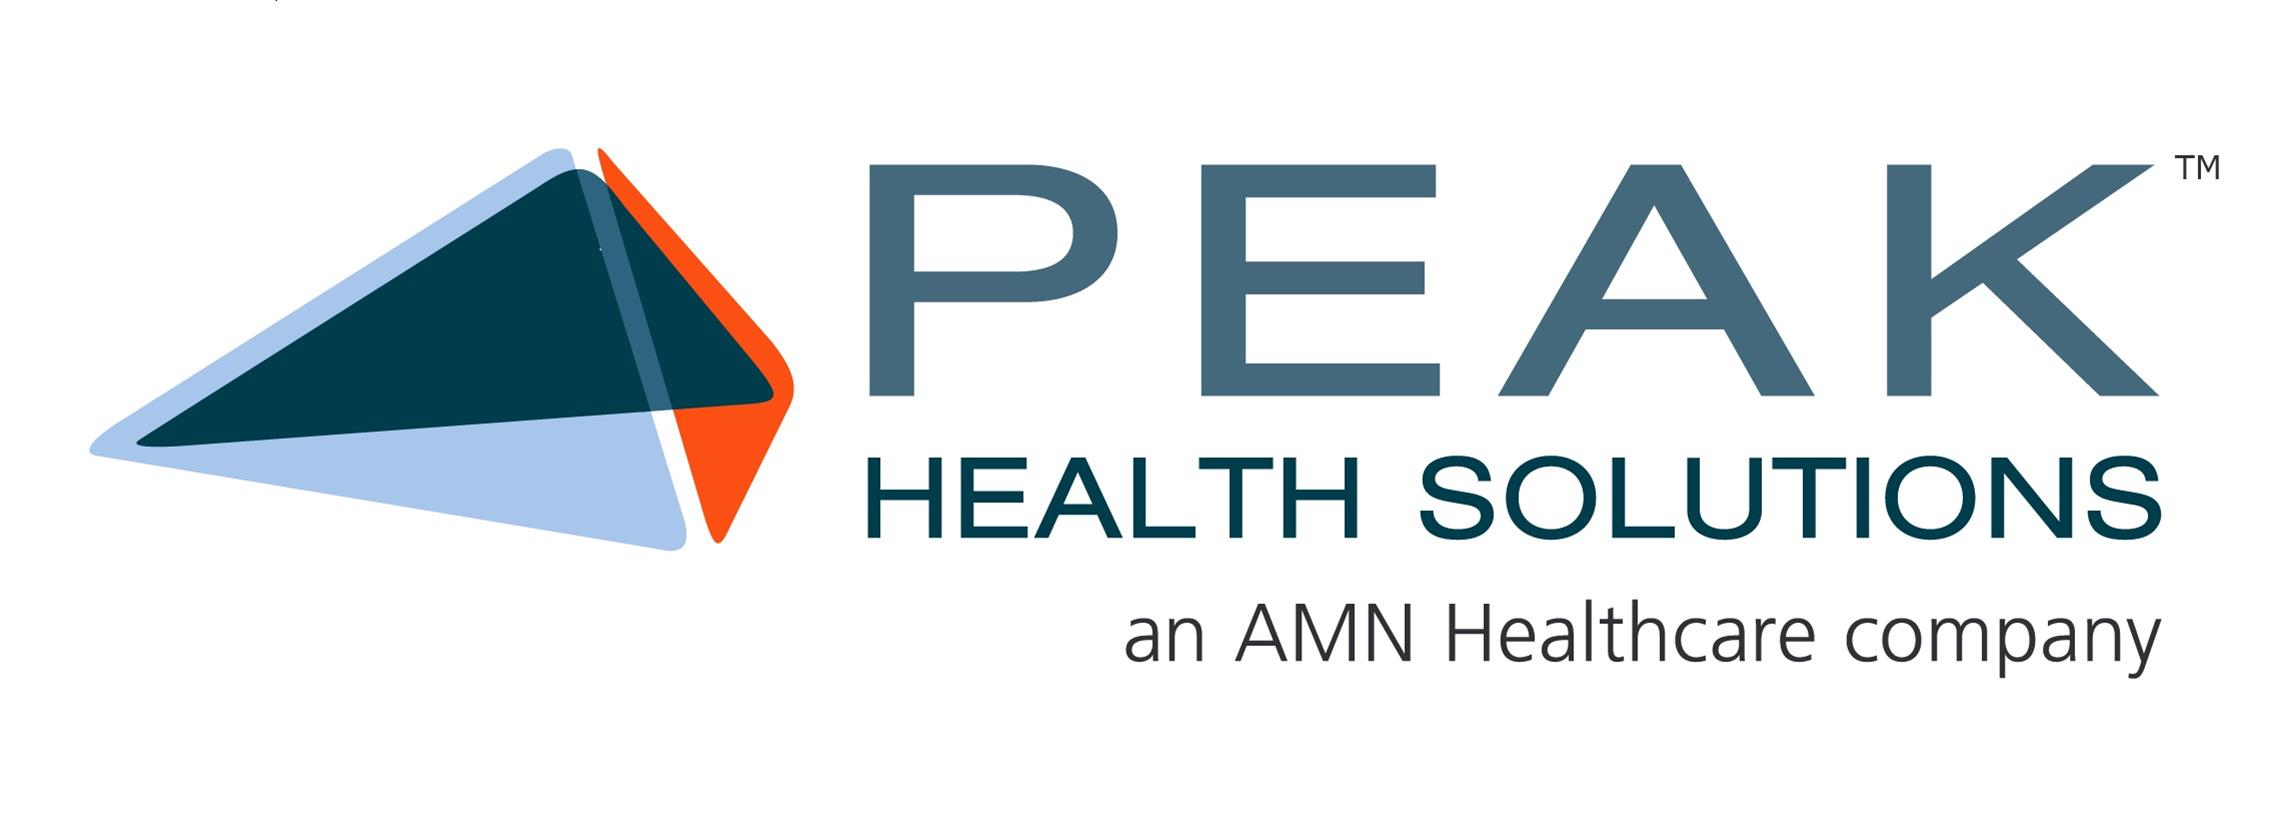 Peak Health Solutions, LLC logo